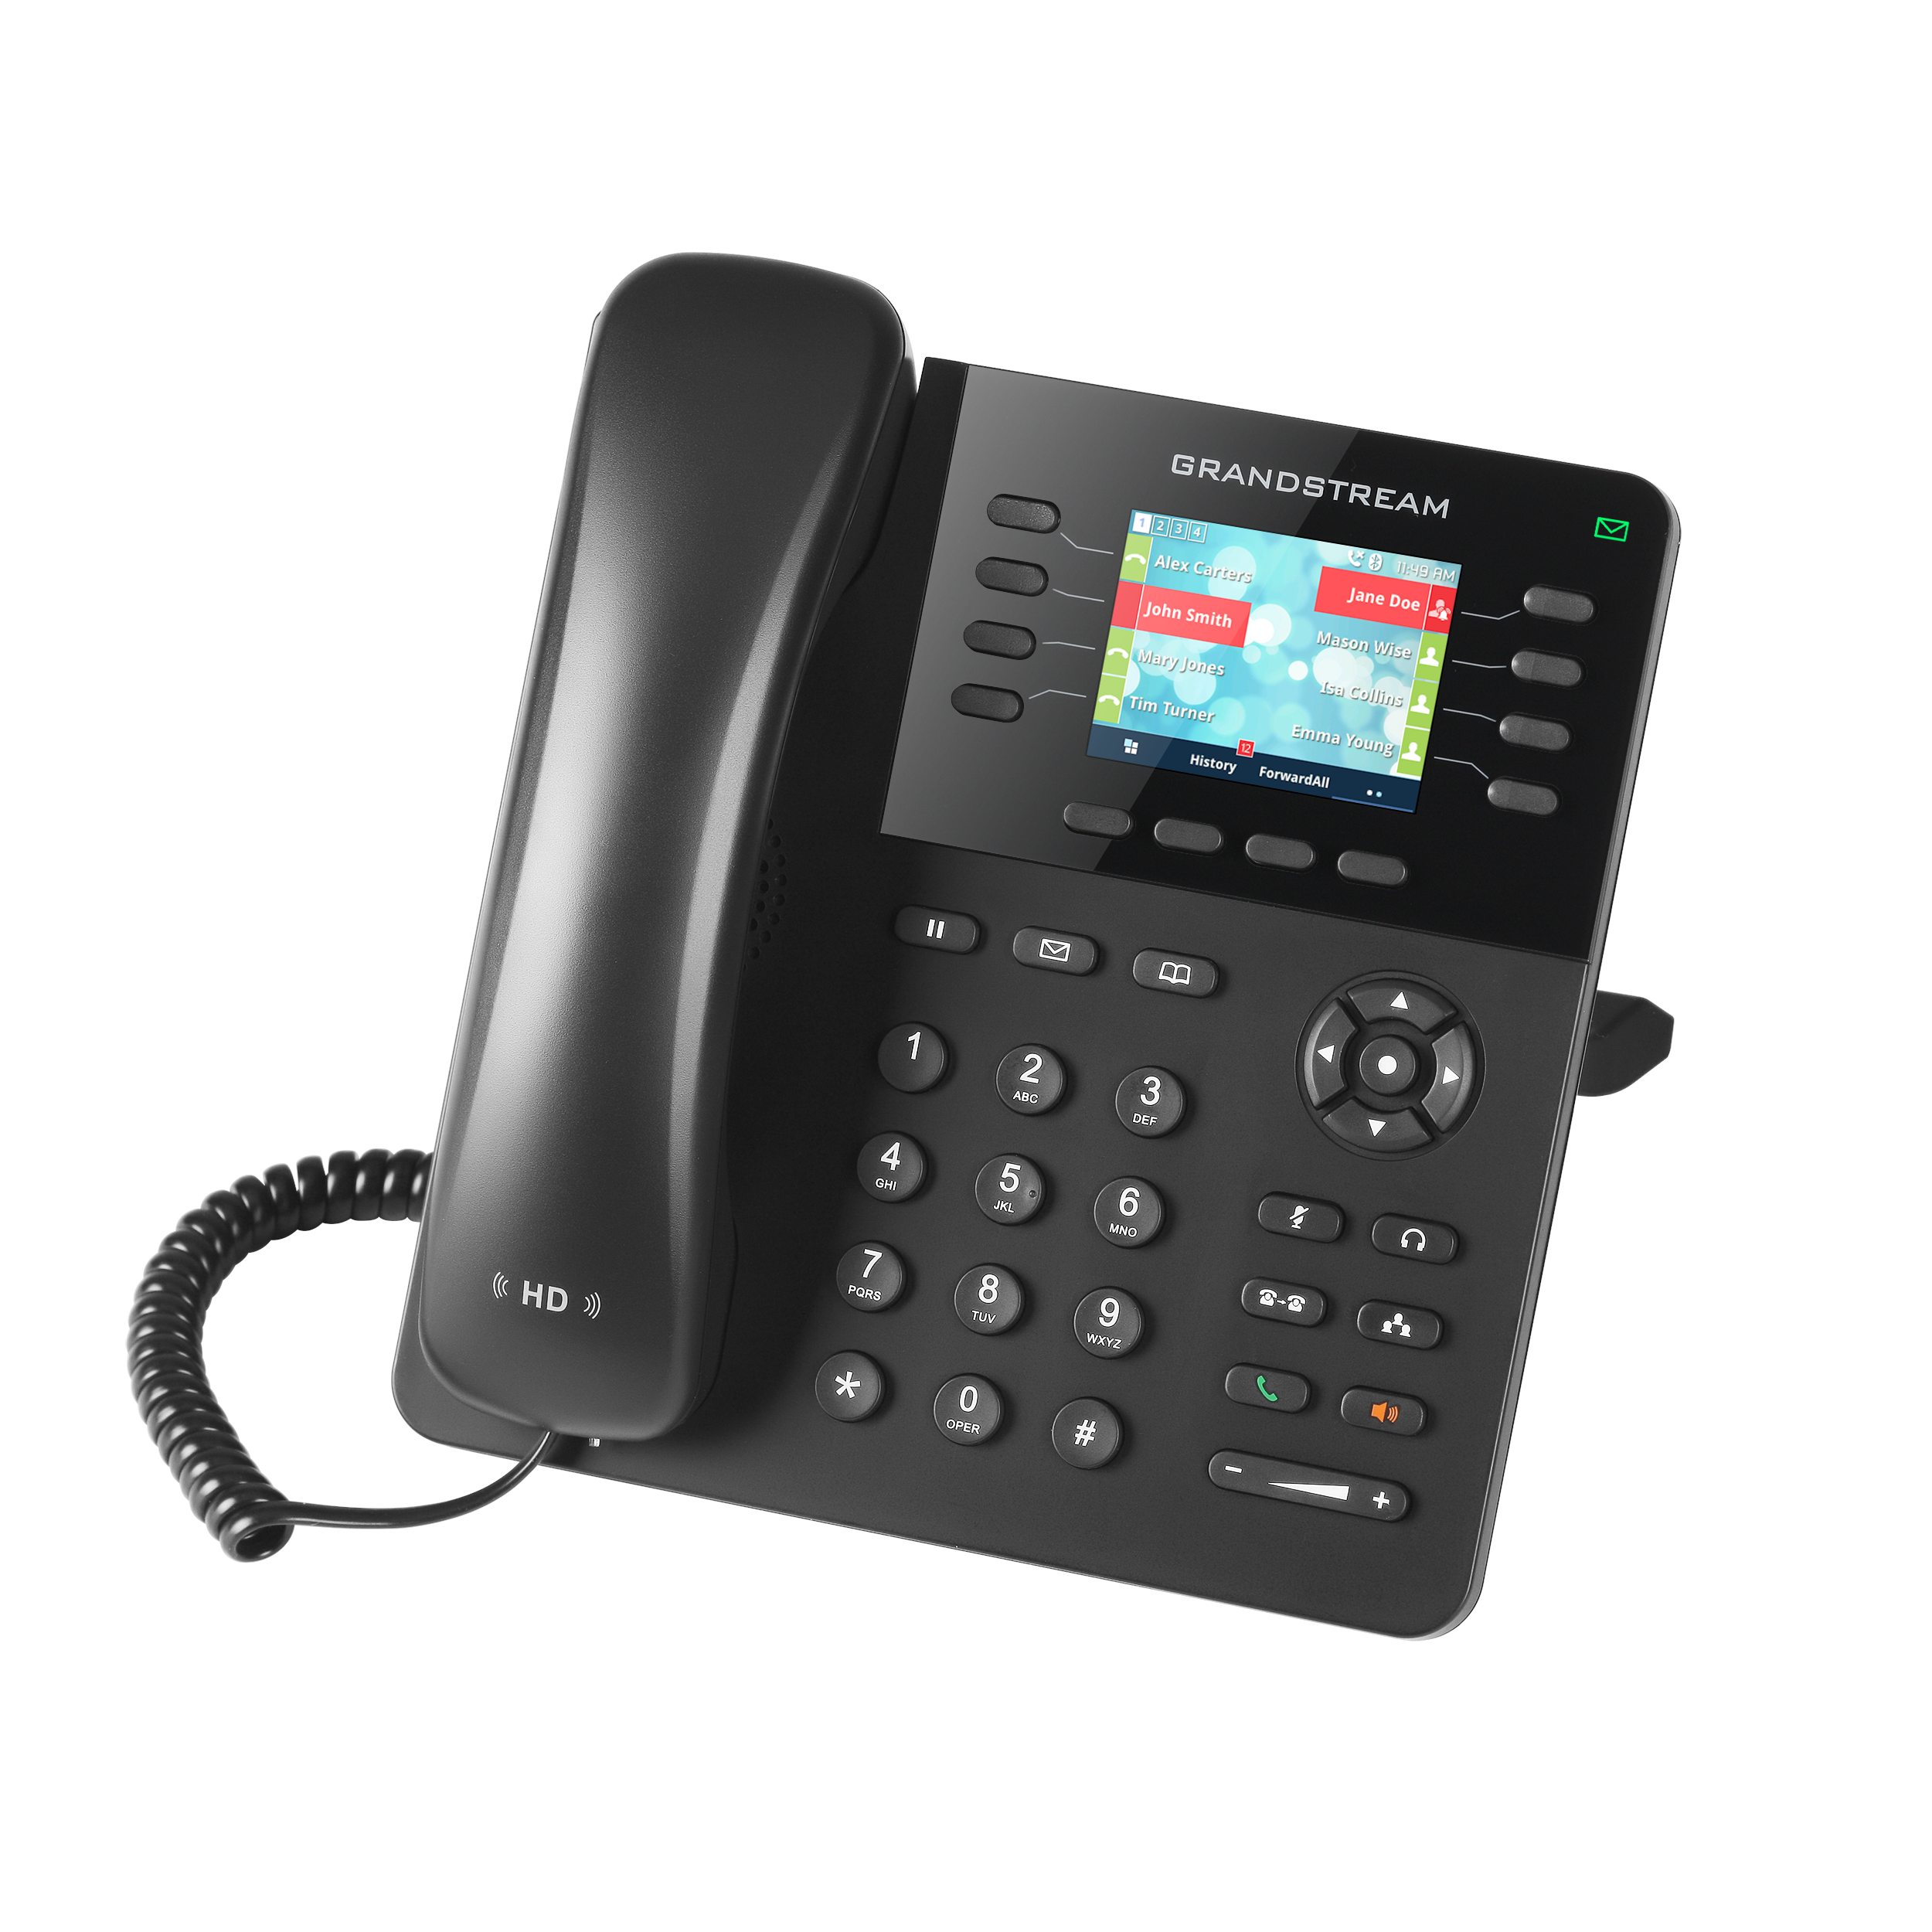 Grandstream GXP2135 High End IP Phone